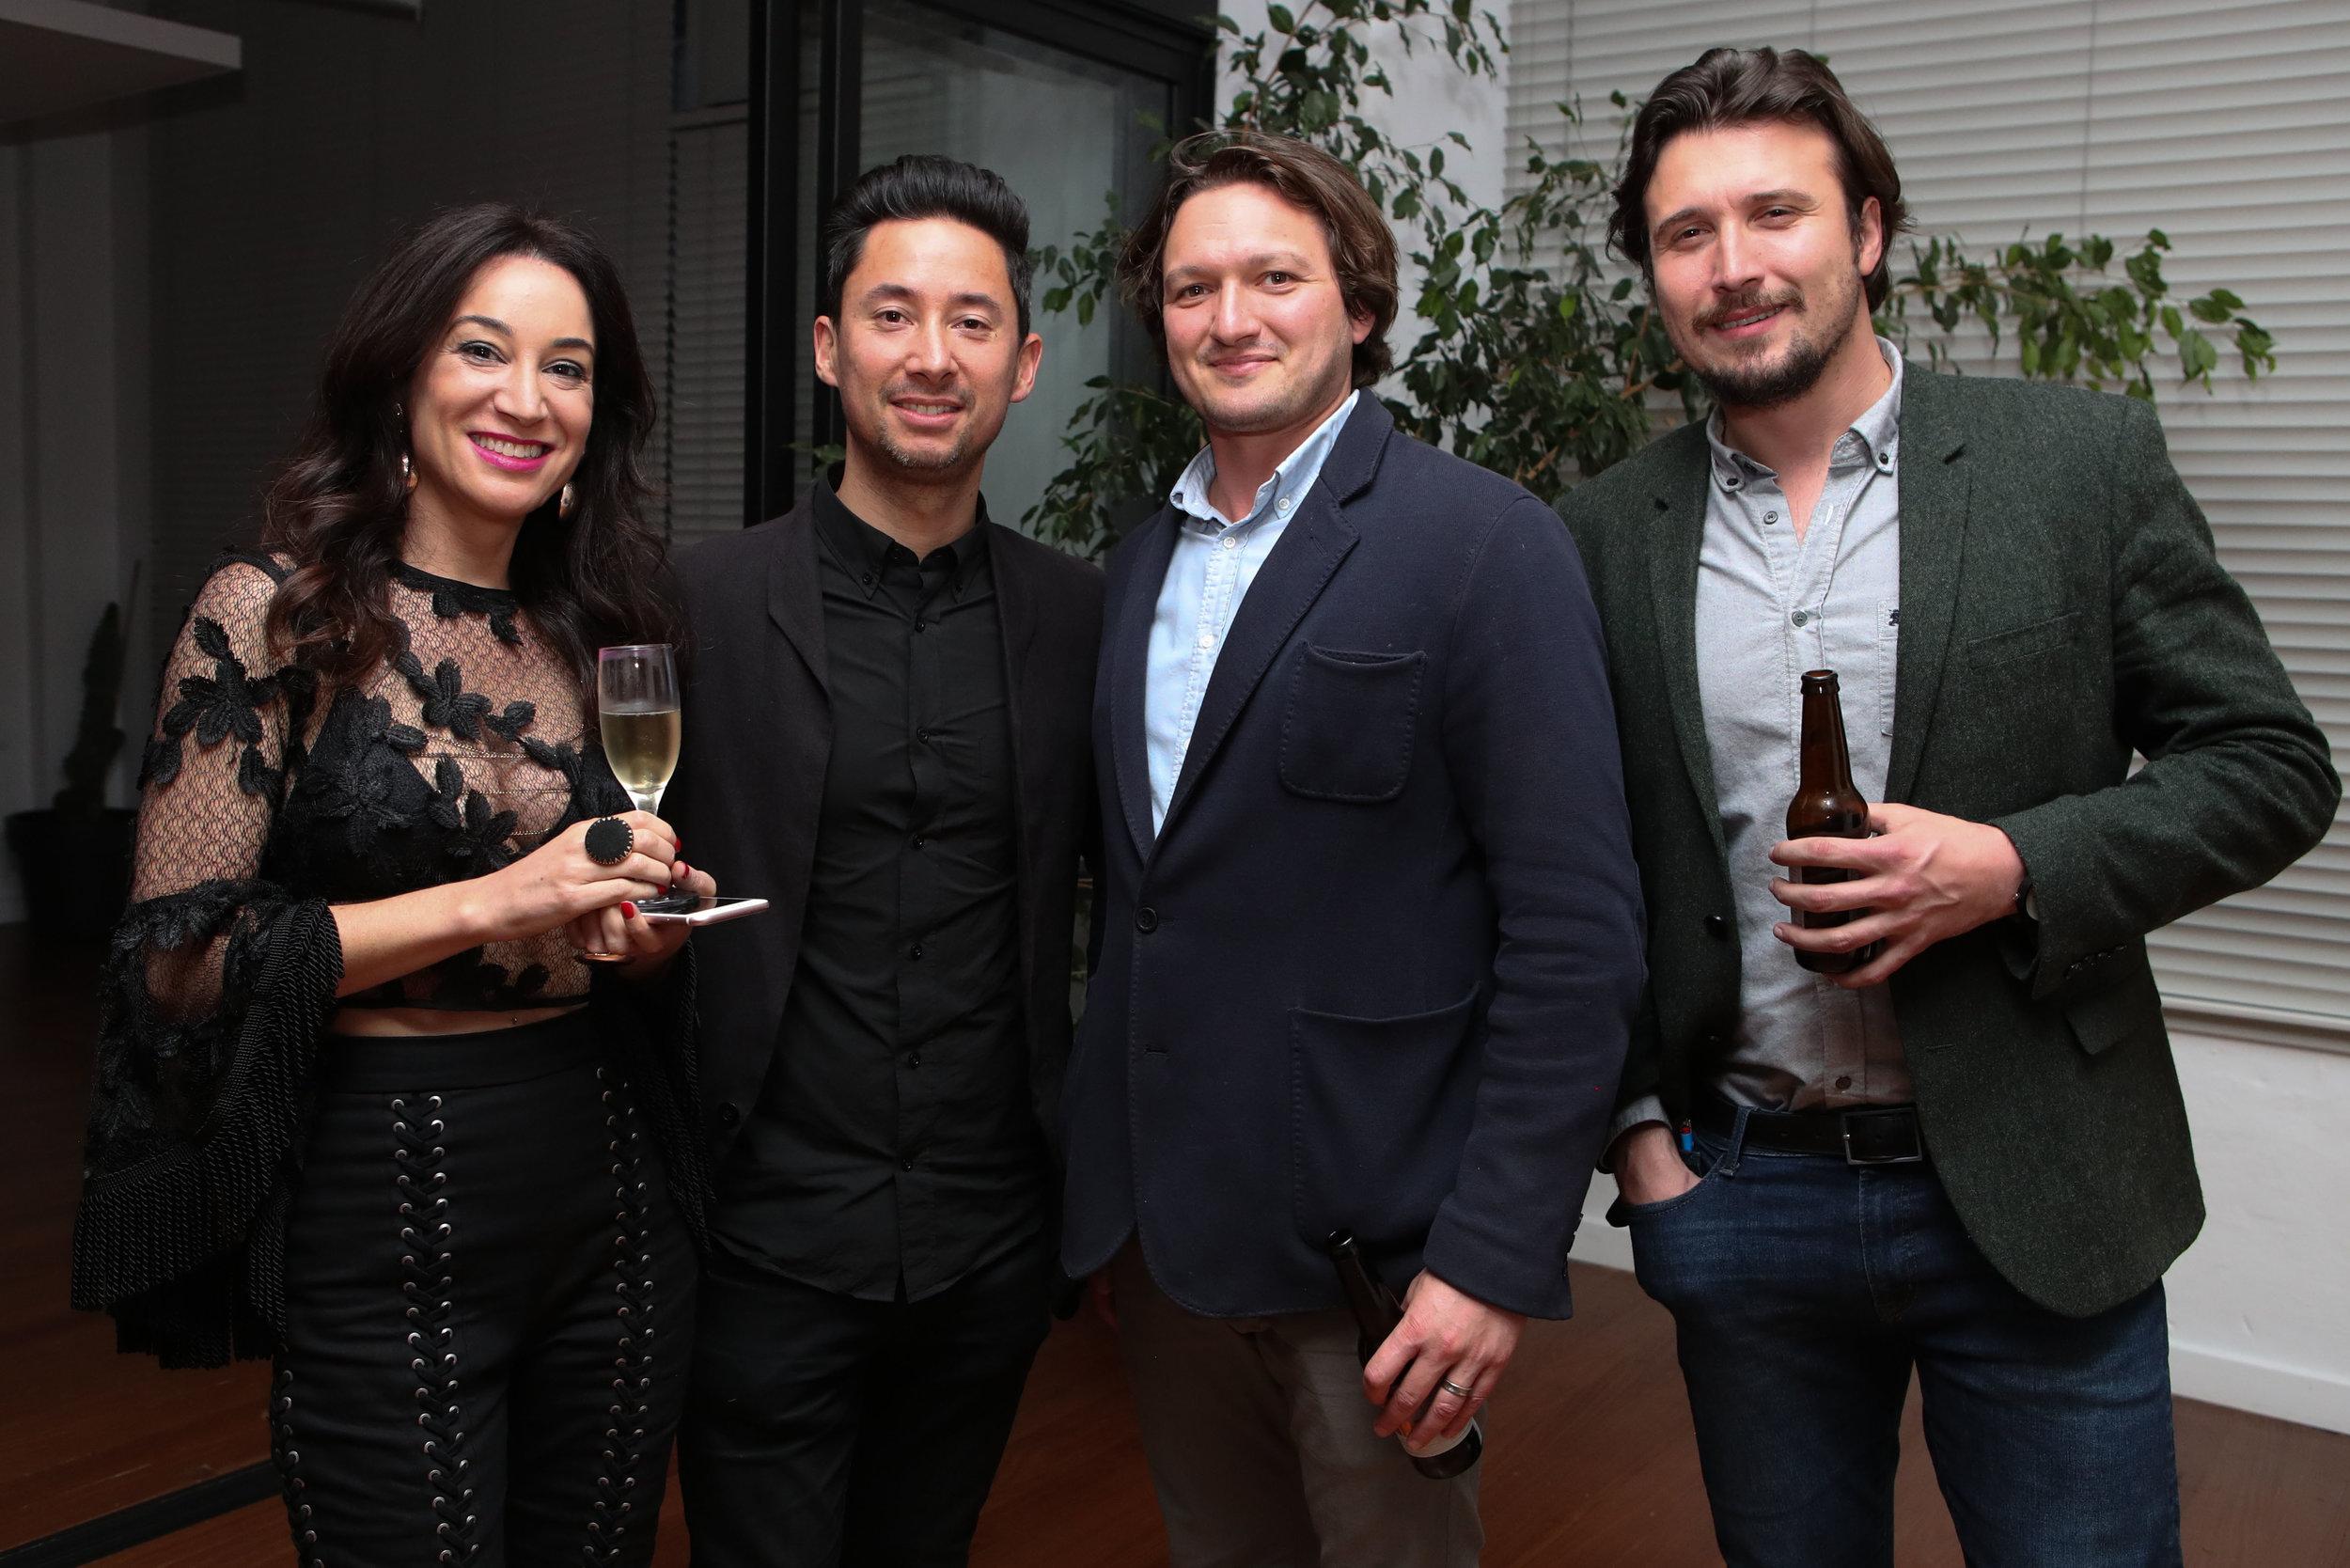 Mayte Rios, Tristan Wong, Mayte, Michael Artemenko and Adi Atic.jpg